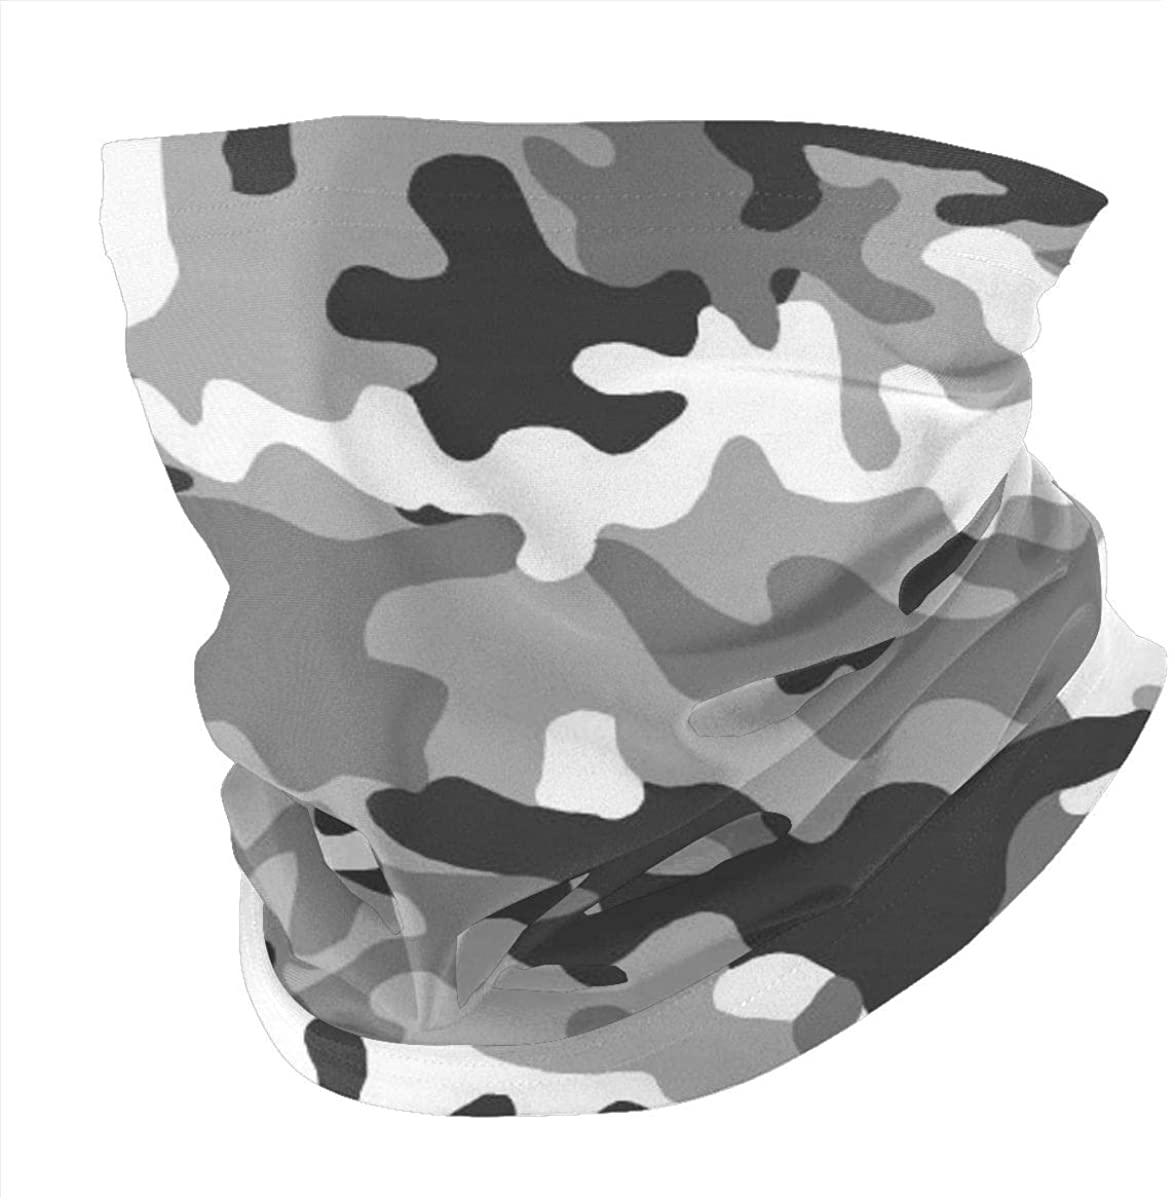 Riiat Black White Gray Camo Urban Camouflage Army Neck Gaiter Bandana Tube Face Mask Headwear Headband Magic Scarf Balaclava Sweatband UV Sun Anti-Wind Dust For Outdoor Sports